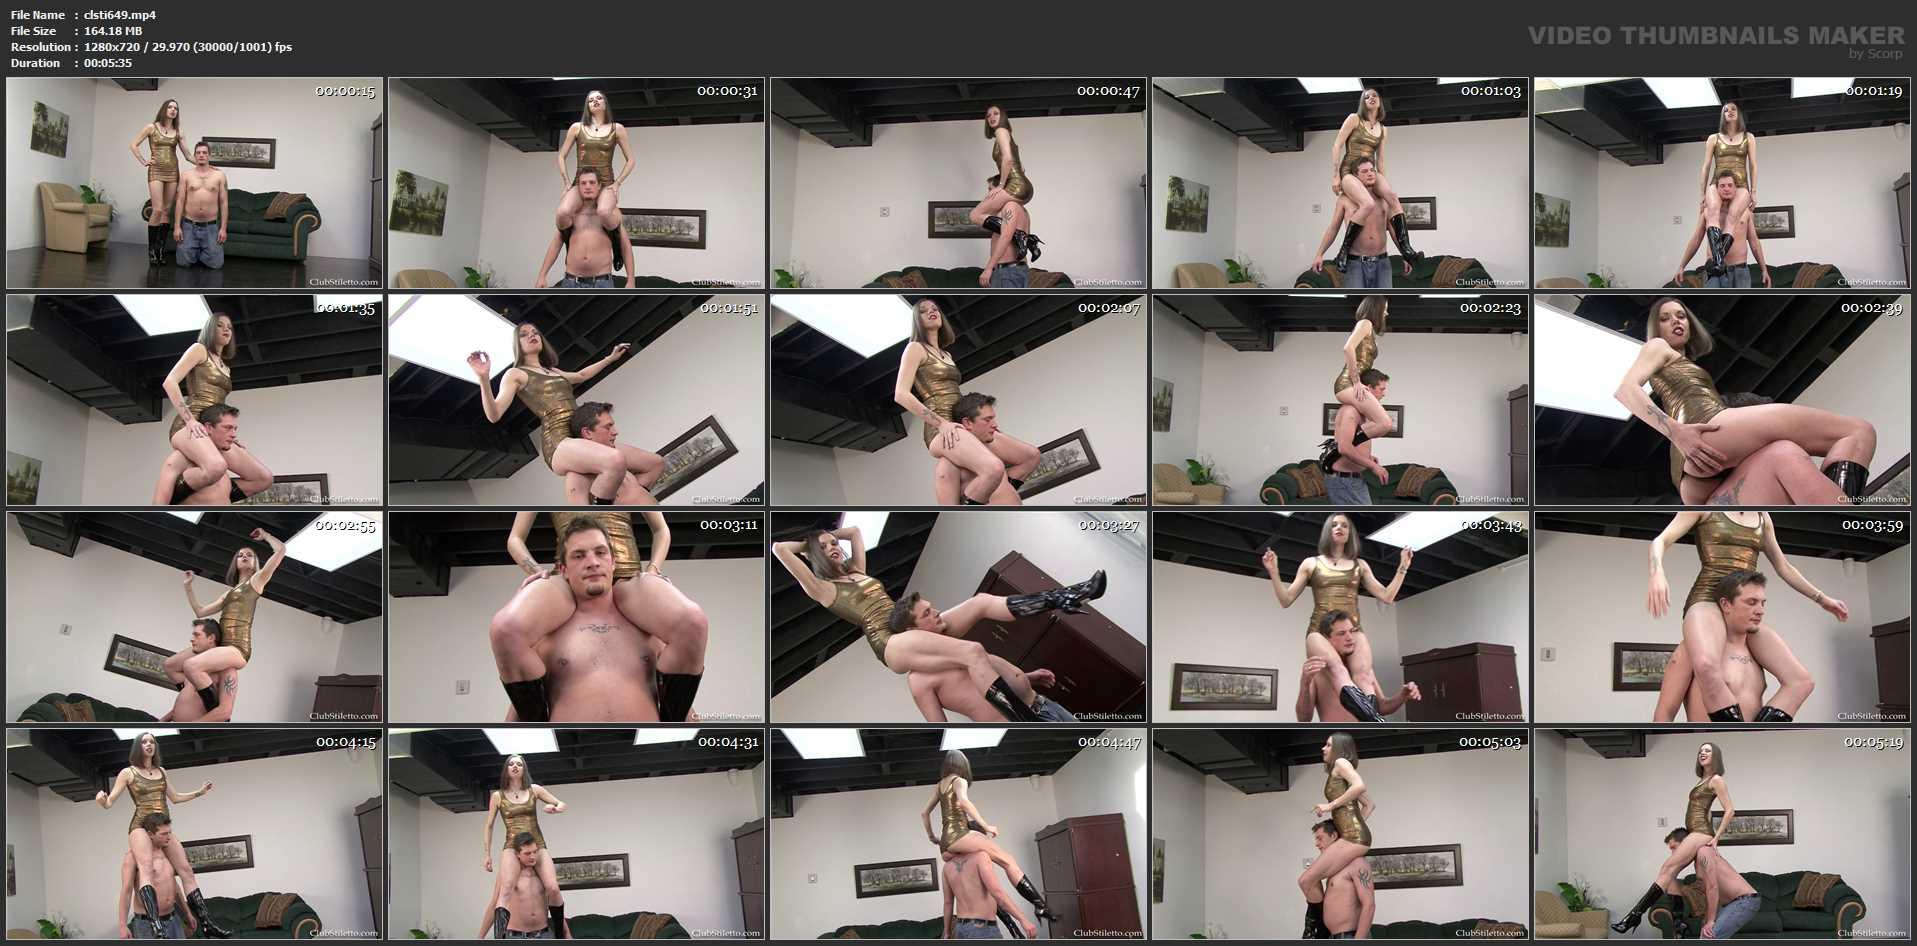 Mistress Bijou Steal In Scene: Work for ME Bitch - CLUBSTILETTO - HD/720p/MP4